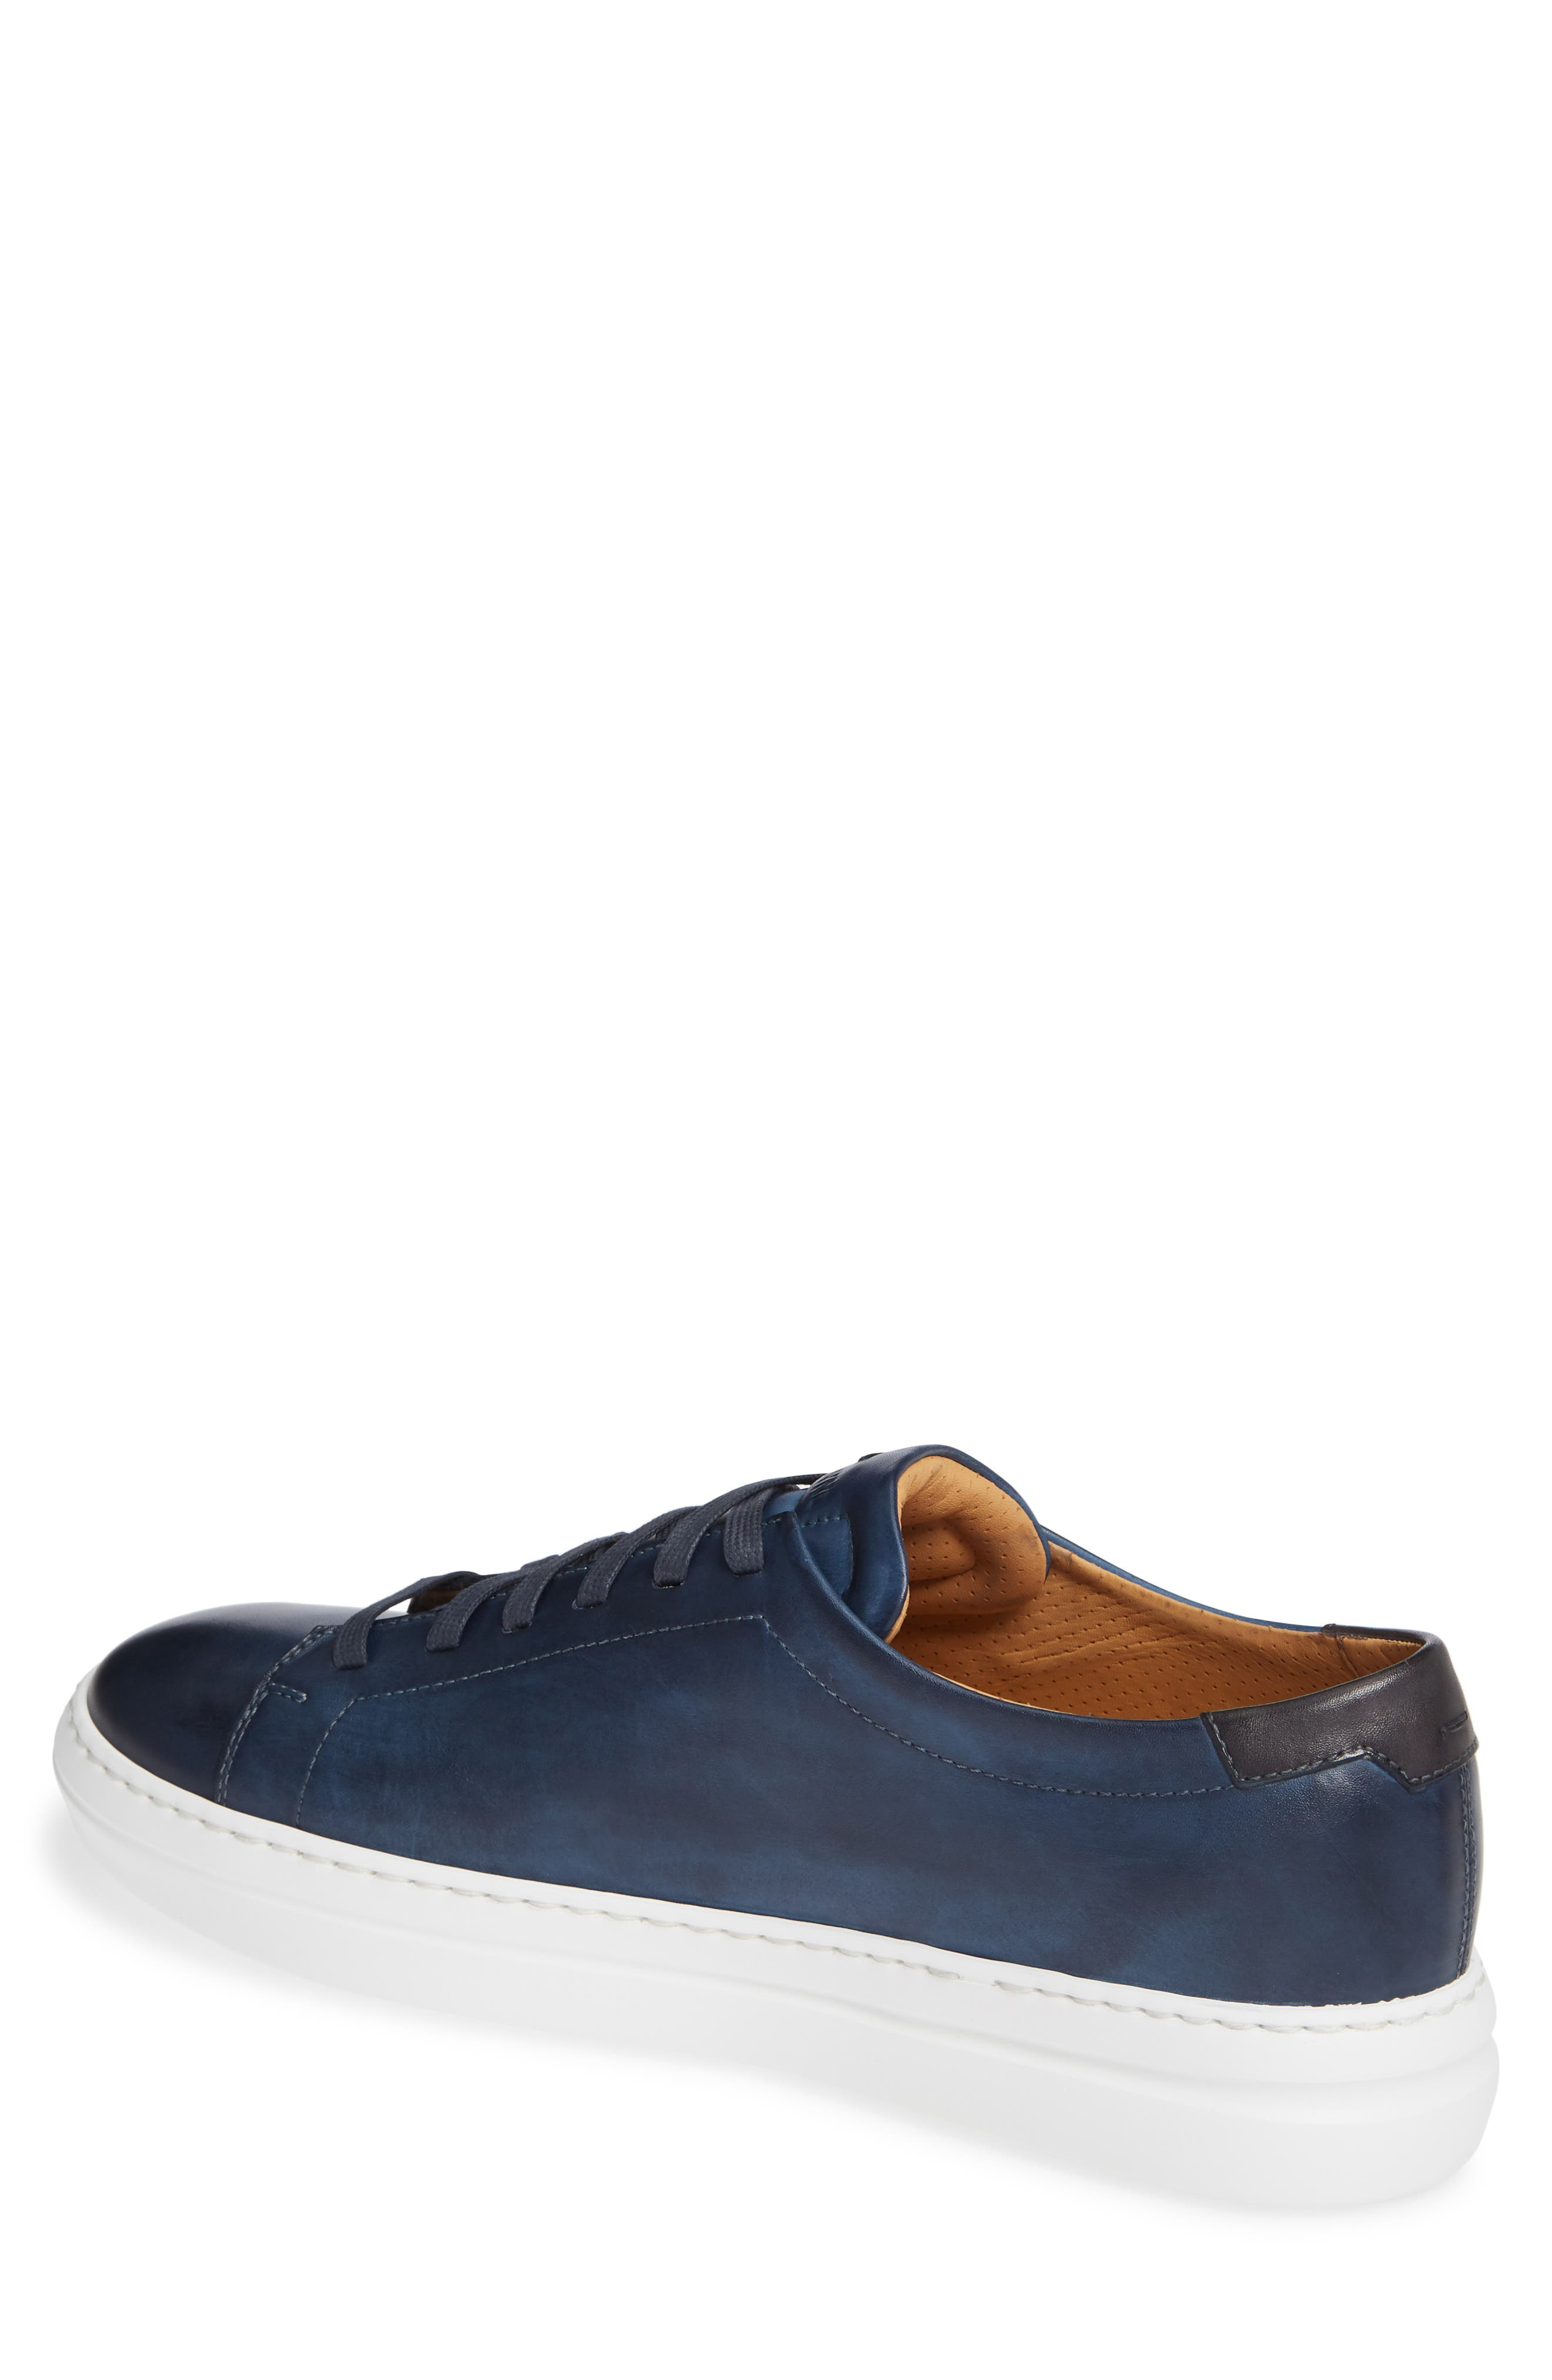 MAGNANNI, Bartolo Sneaker, Alternate thumbnail 2, color, NAVY LEATHER